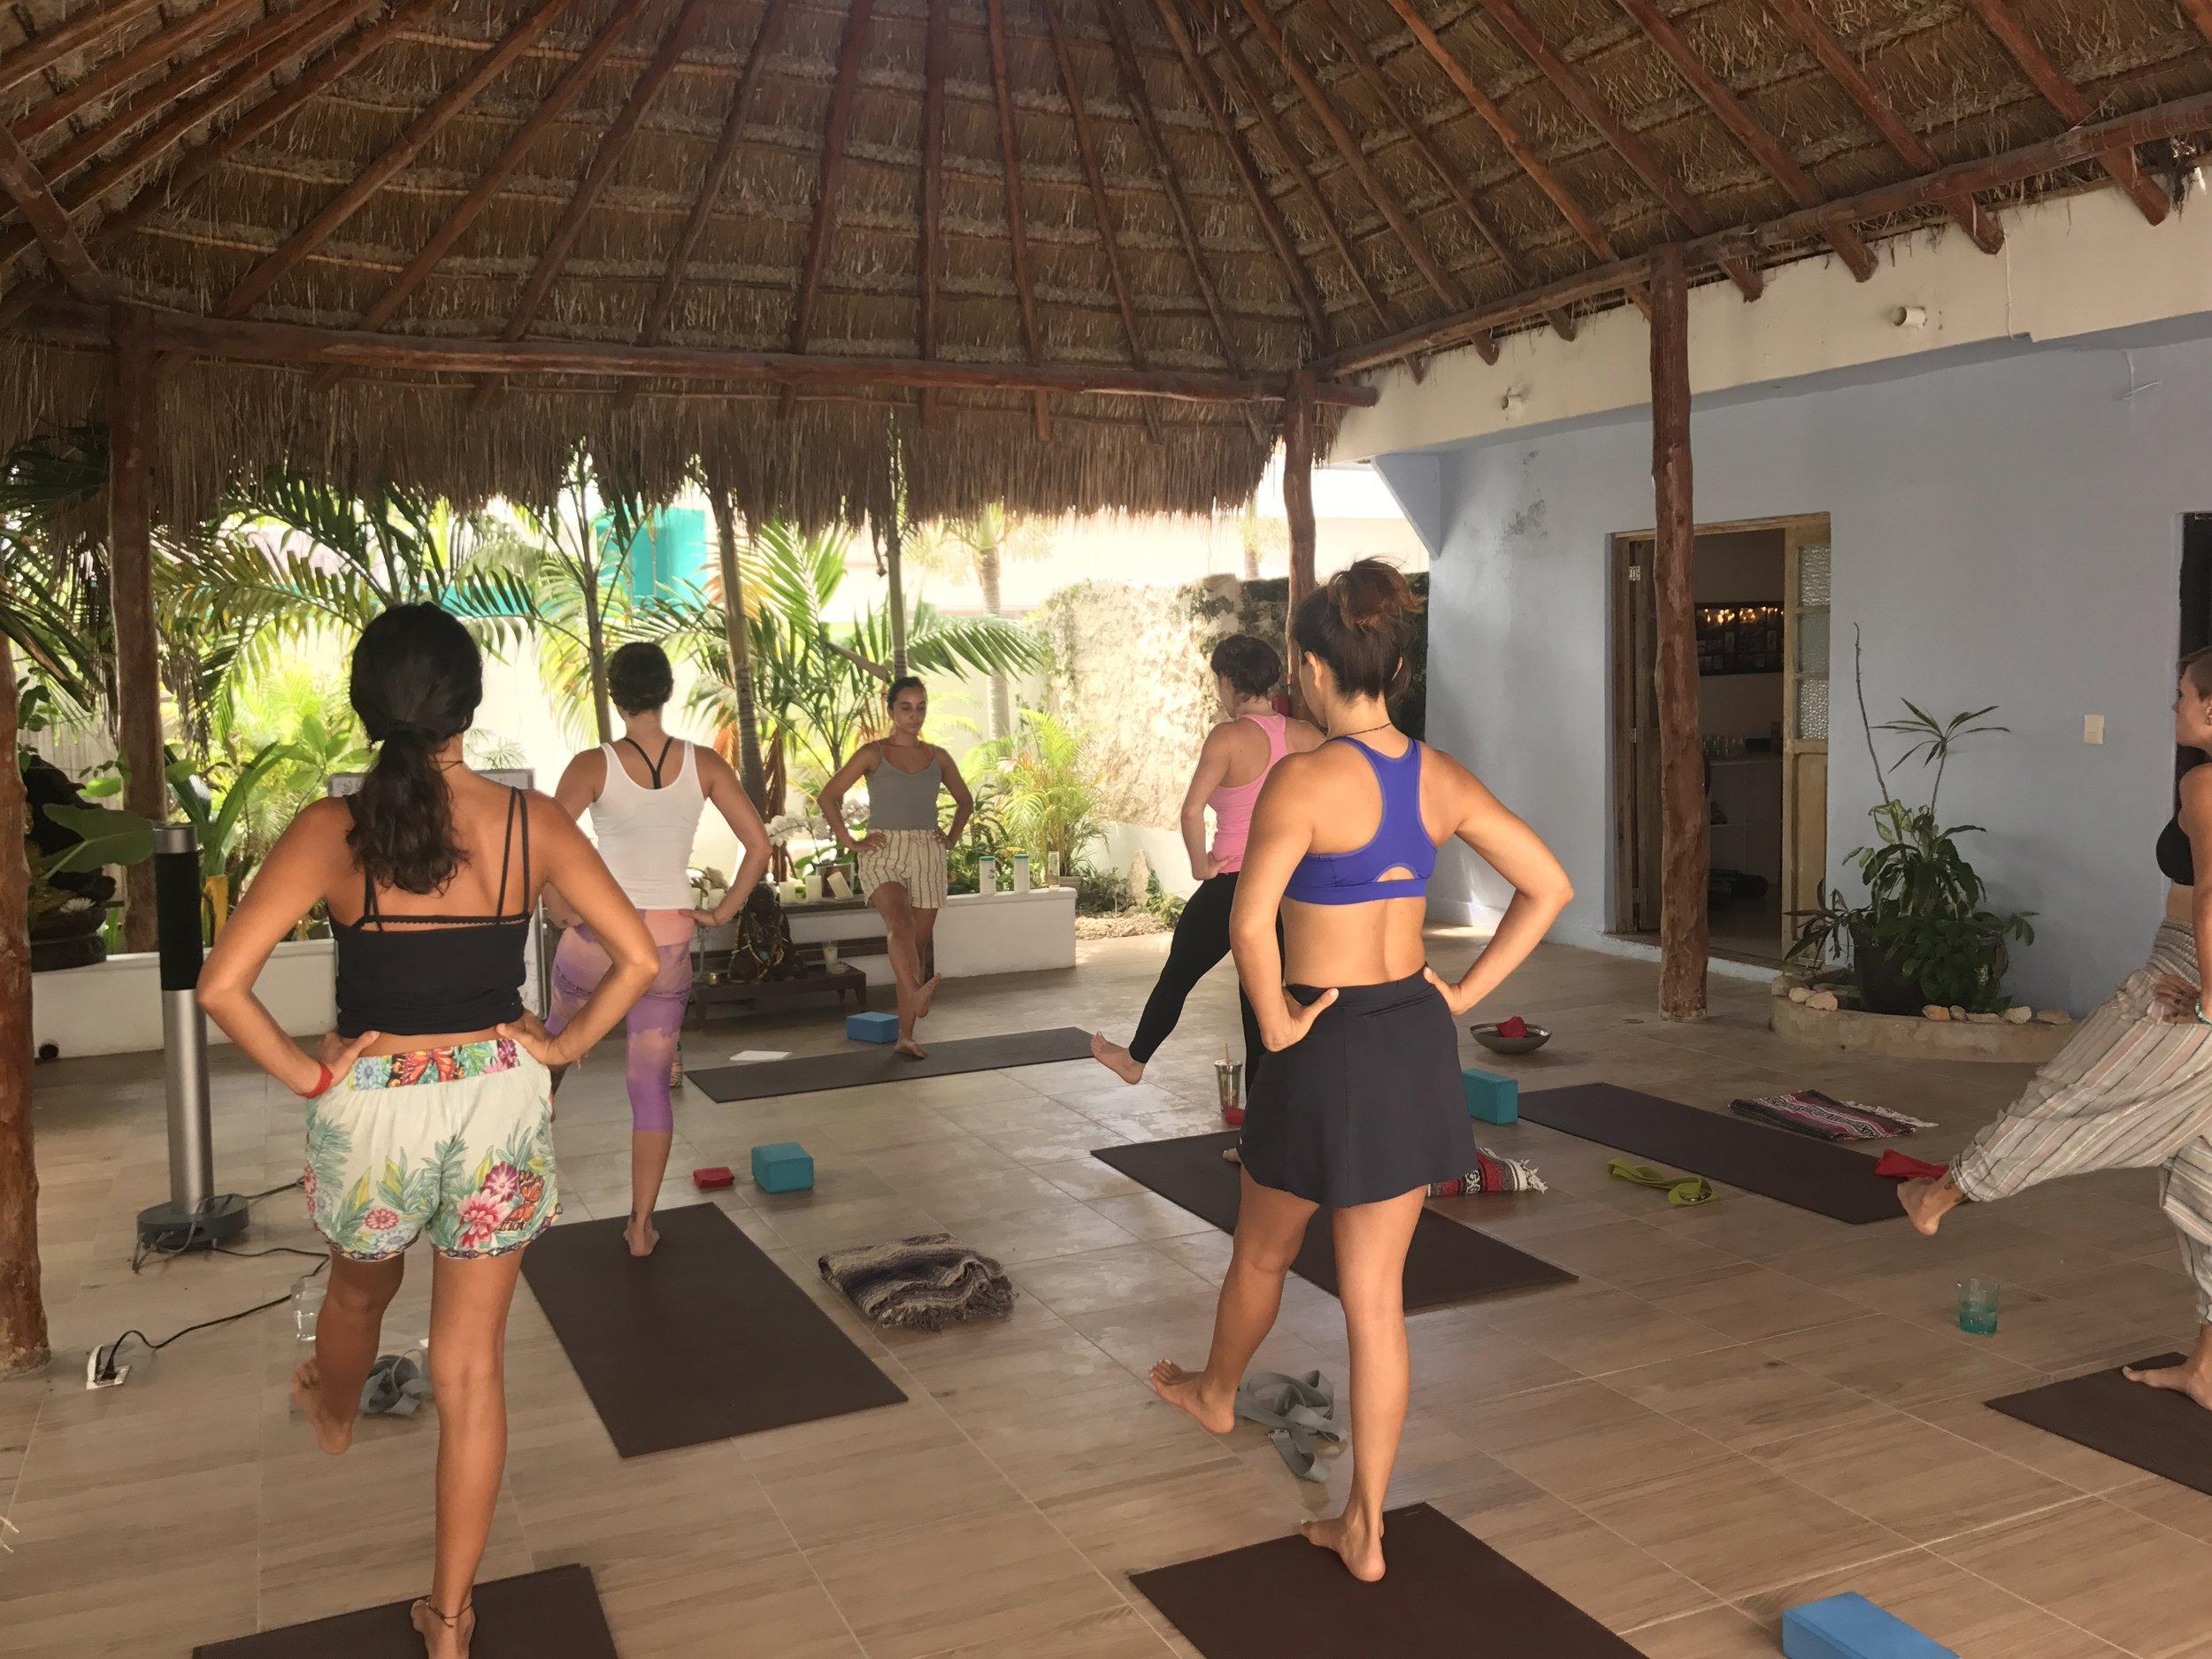 200hr YTT November 2018 - November 2-25 2018Isla Mujeres, MexicoRed Buddha Yoga + WellnessBefore July 15 2018 $2100USDAfter July 15, $2500USD15 students max capacity.